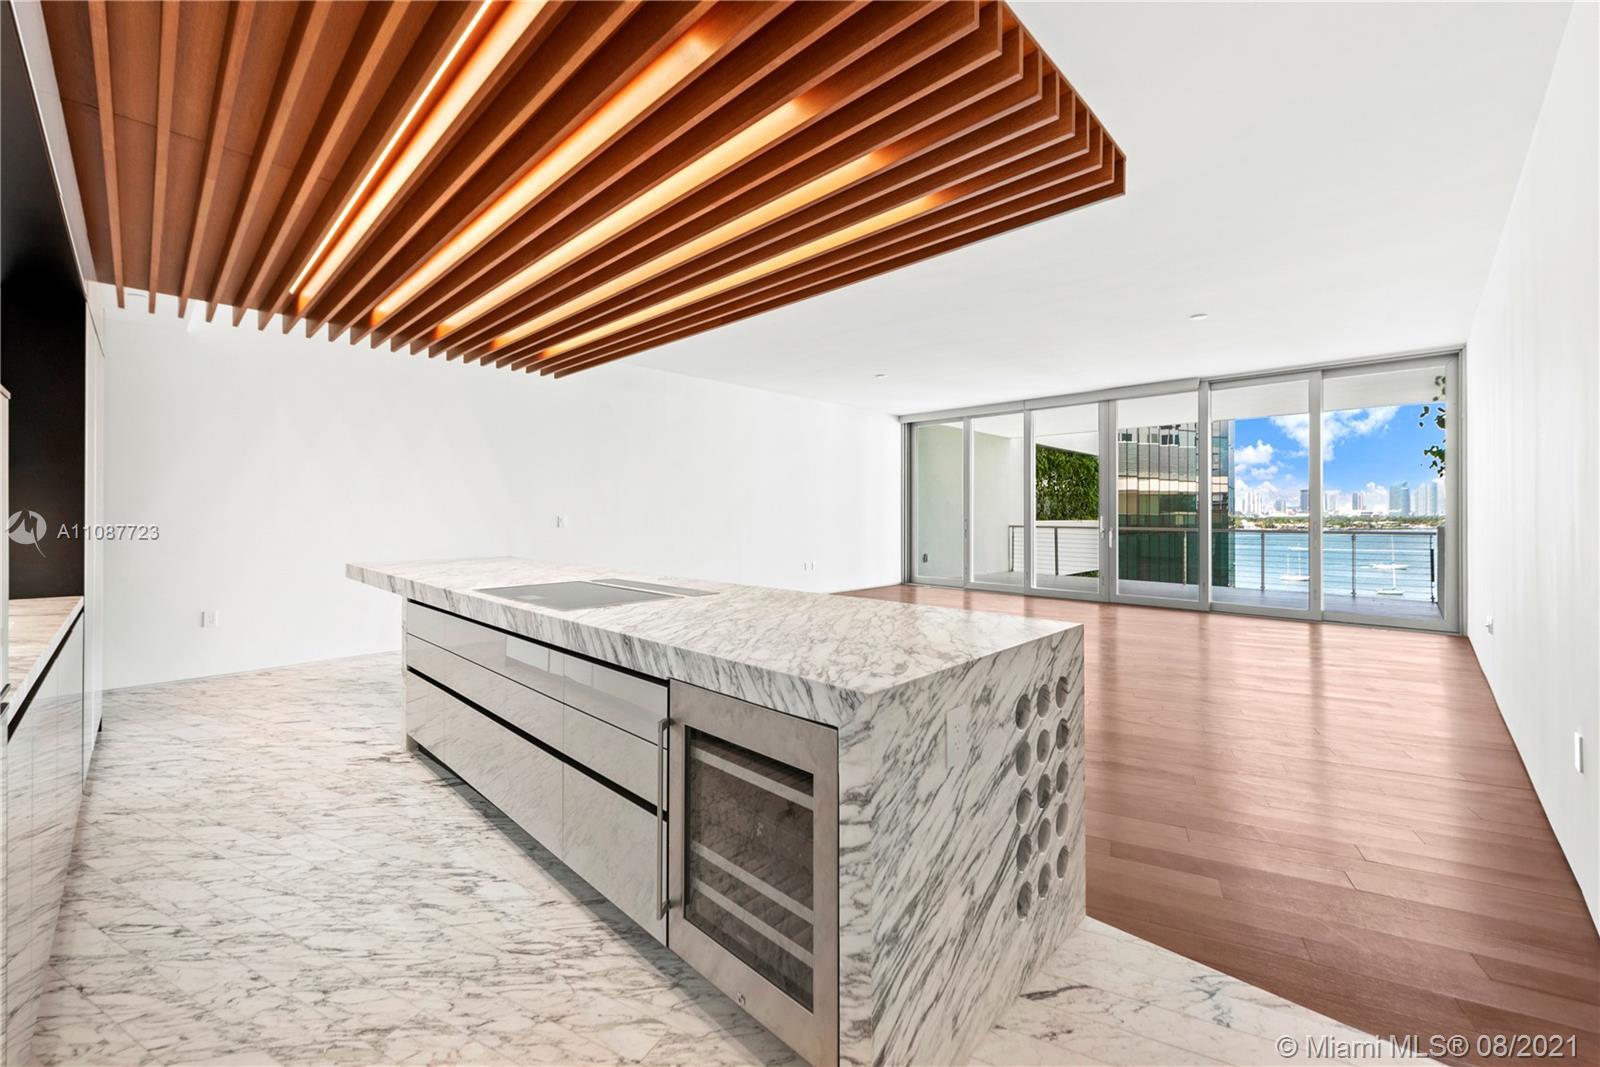 Monad Terrace #8D - 1300 Monad Terrace #8D, Miami Beach, FL 33139